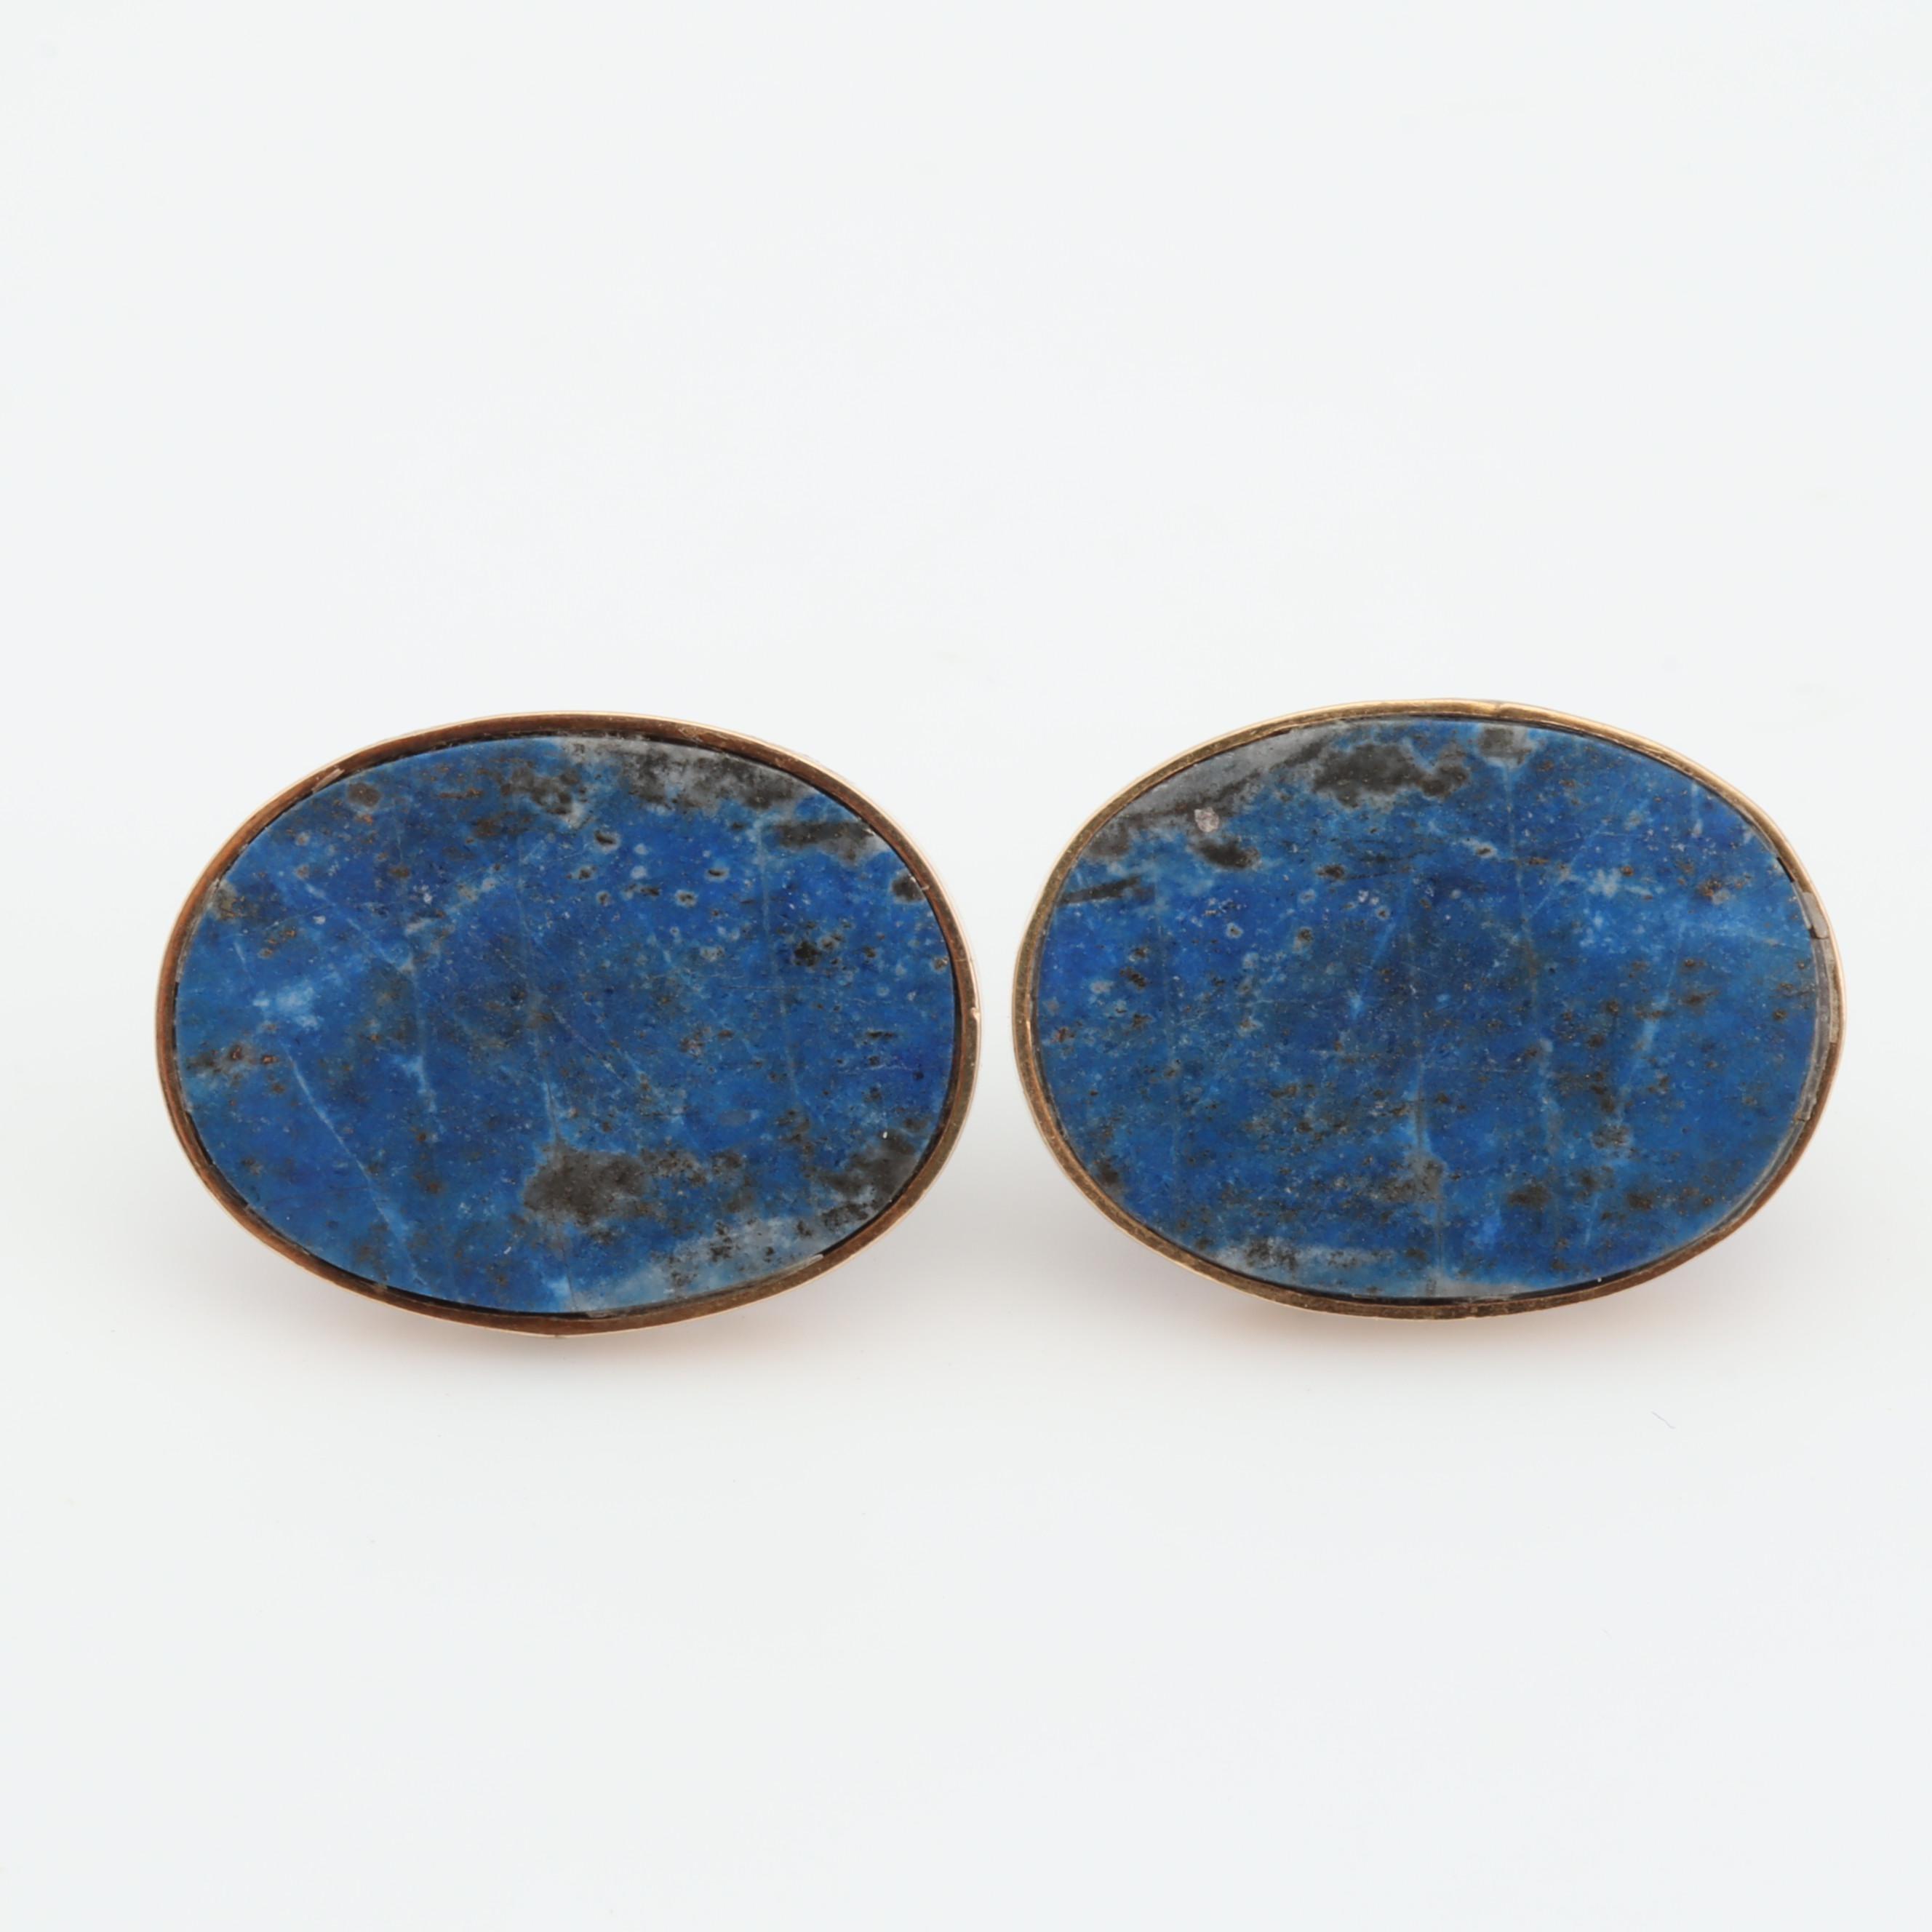 14K Yellow Gold Oval Lapis Lazuli Earrings